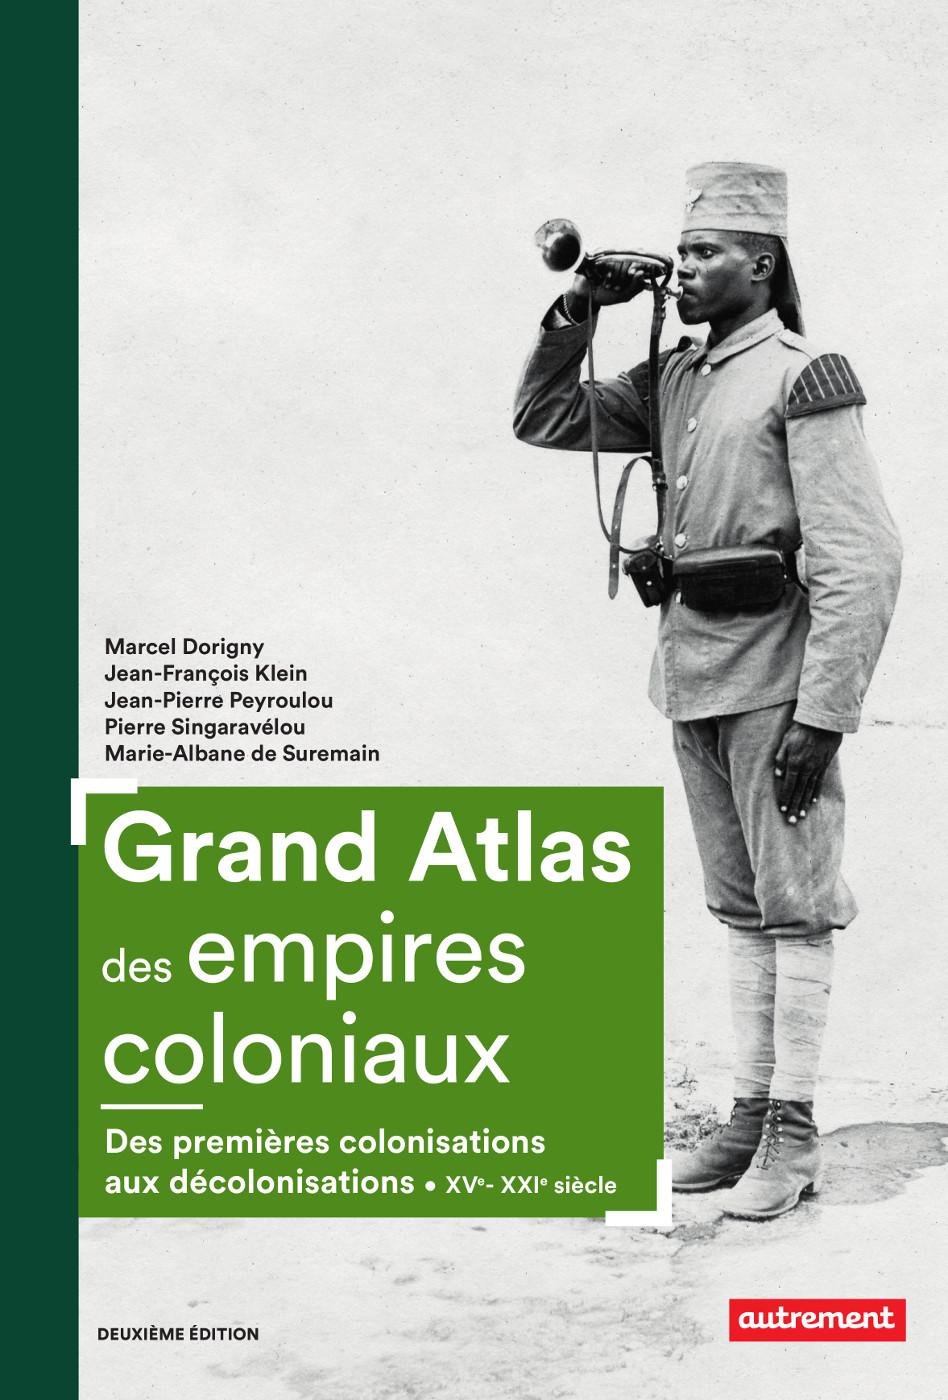 Grand Atlas des empires col...